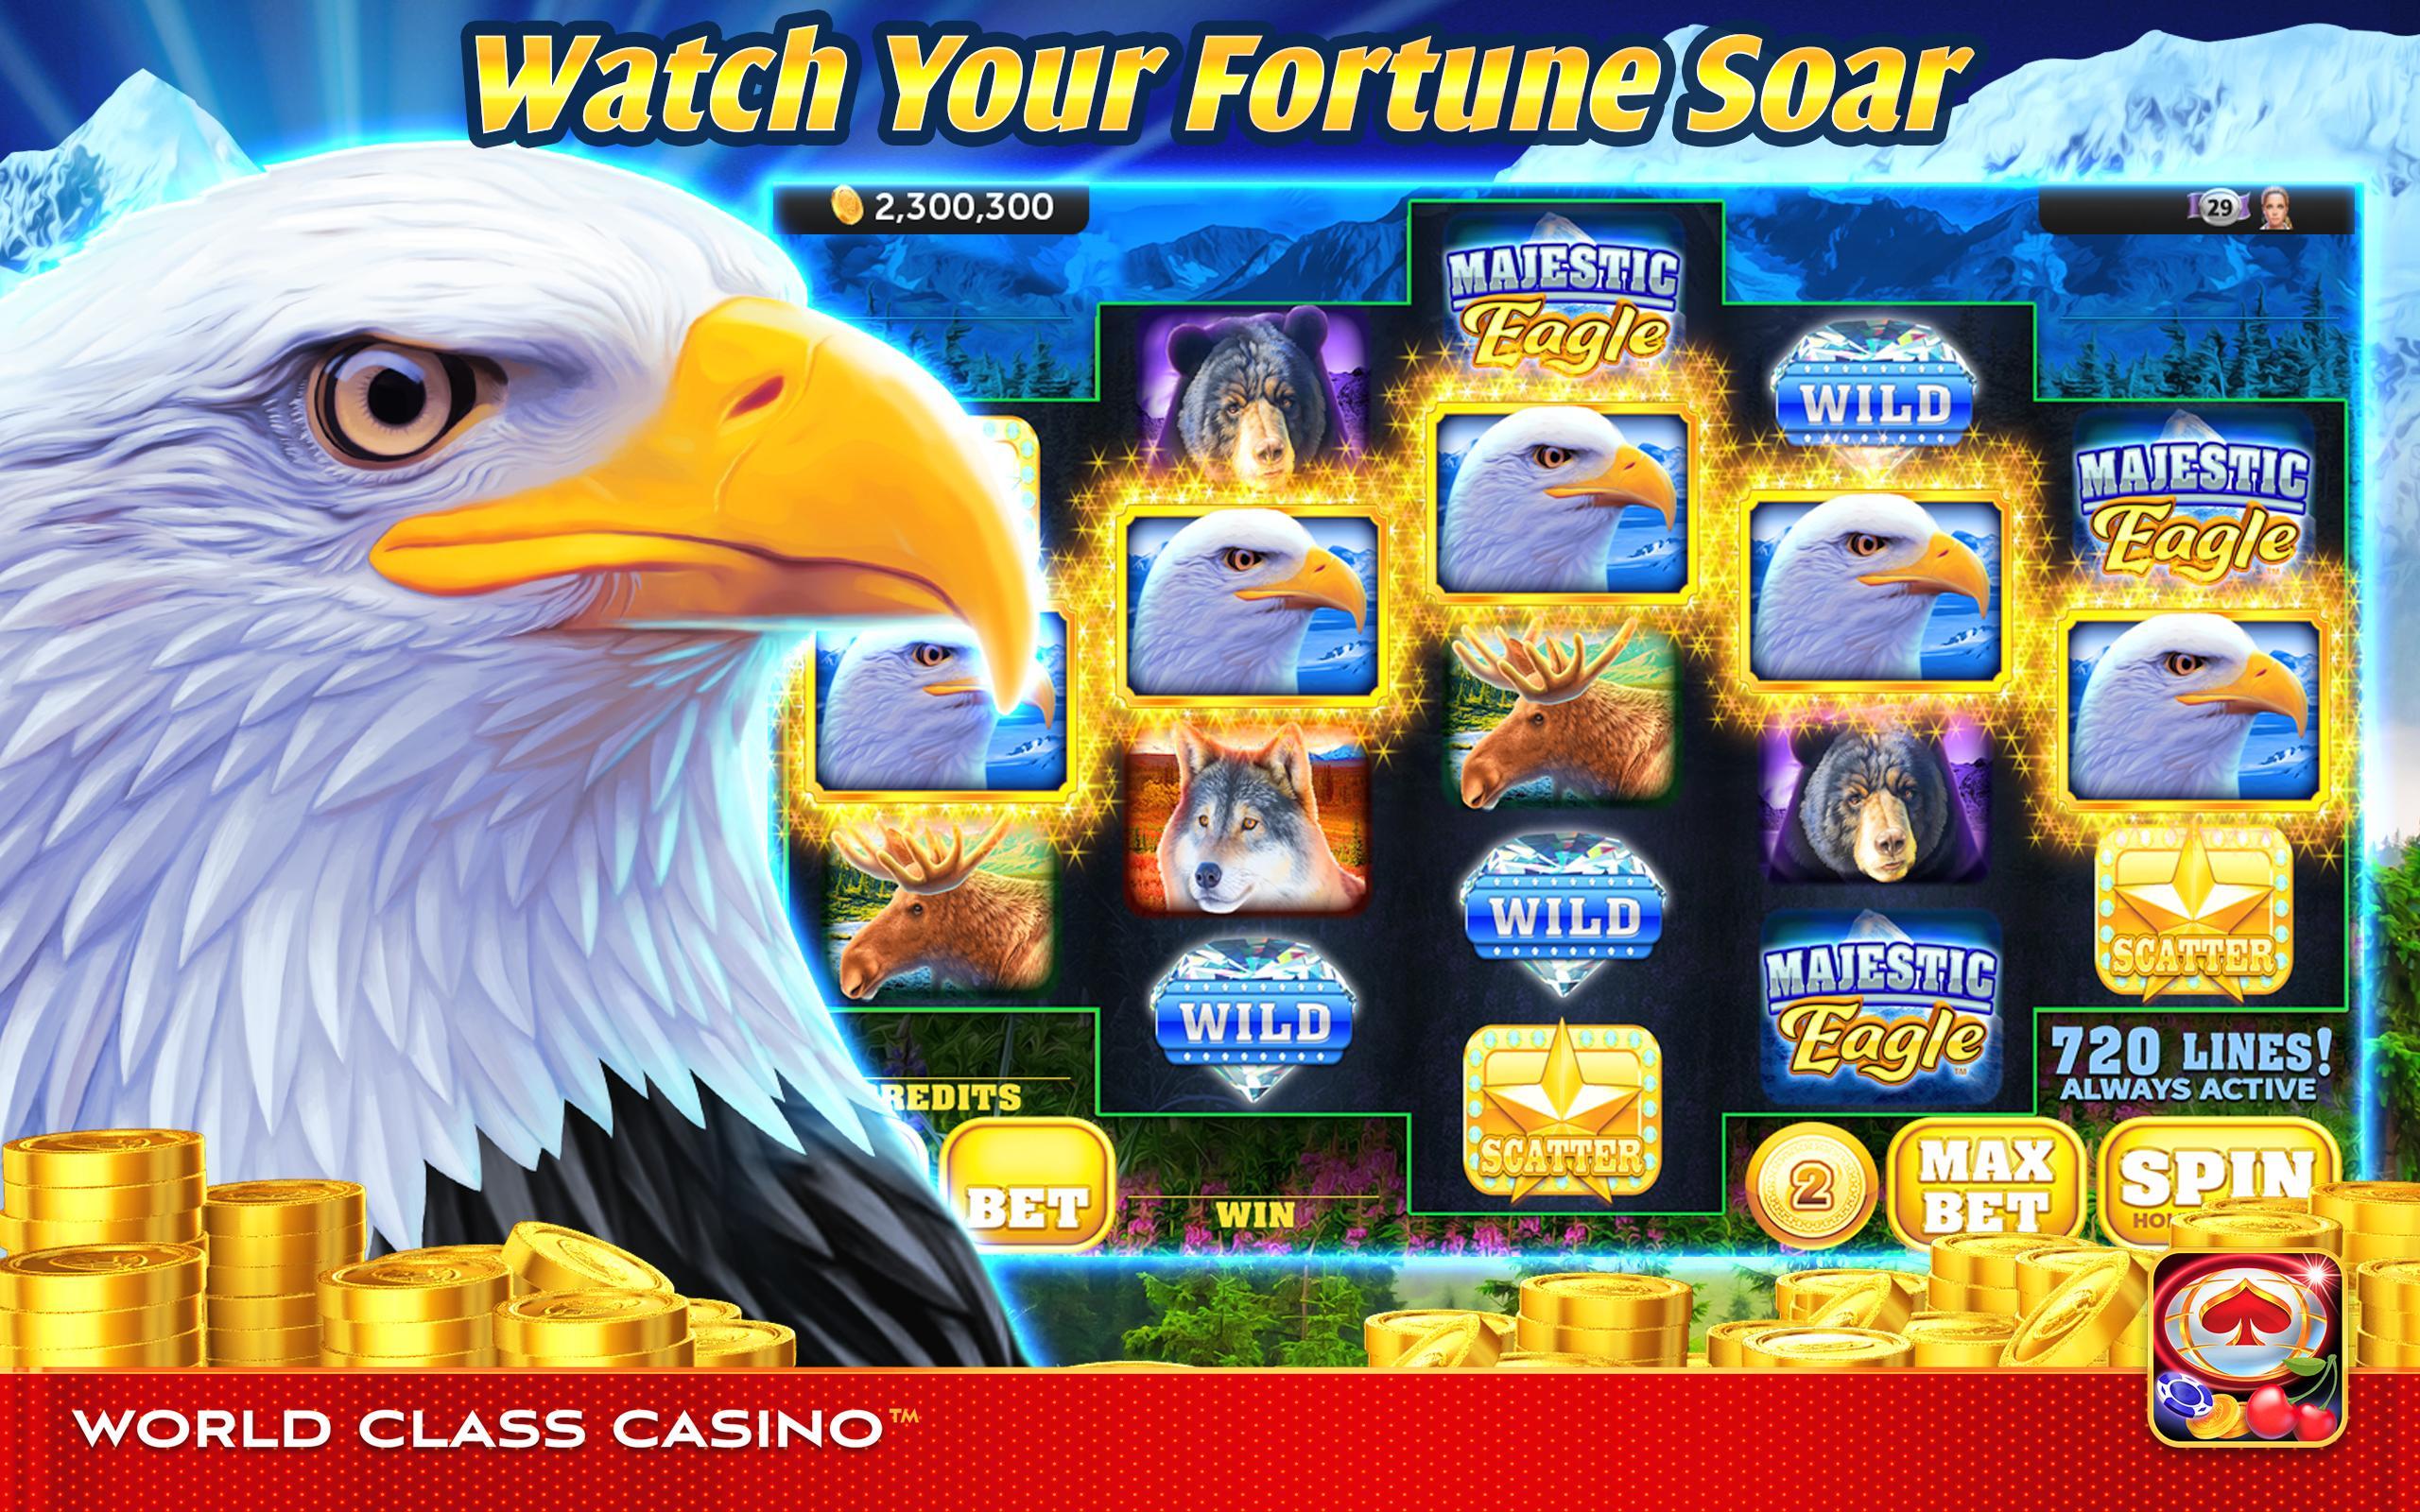 World Class Casino Slots, Blackjack & Poker Room 8.0.4 Screenshot 13